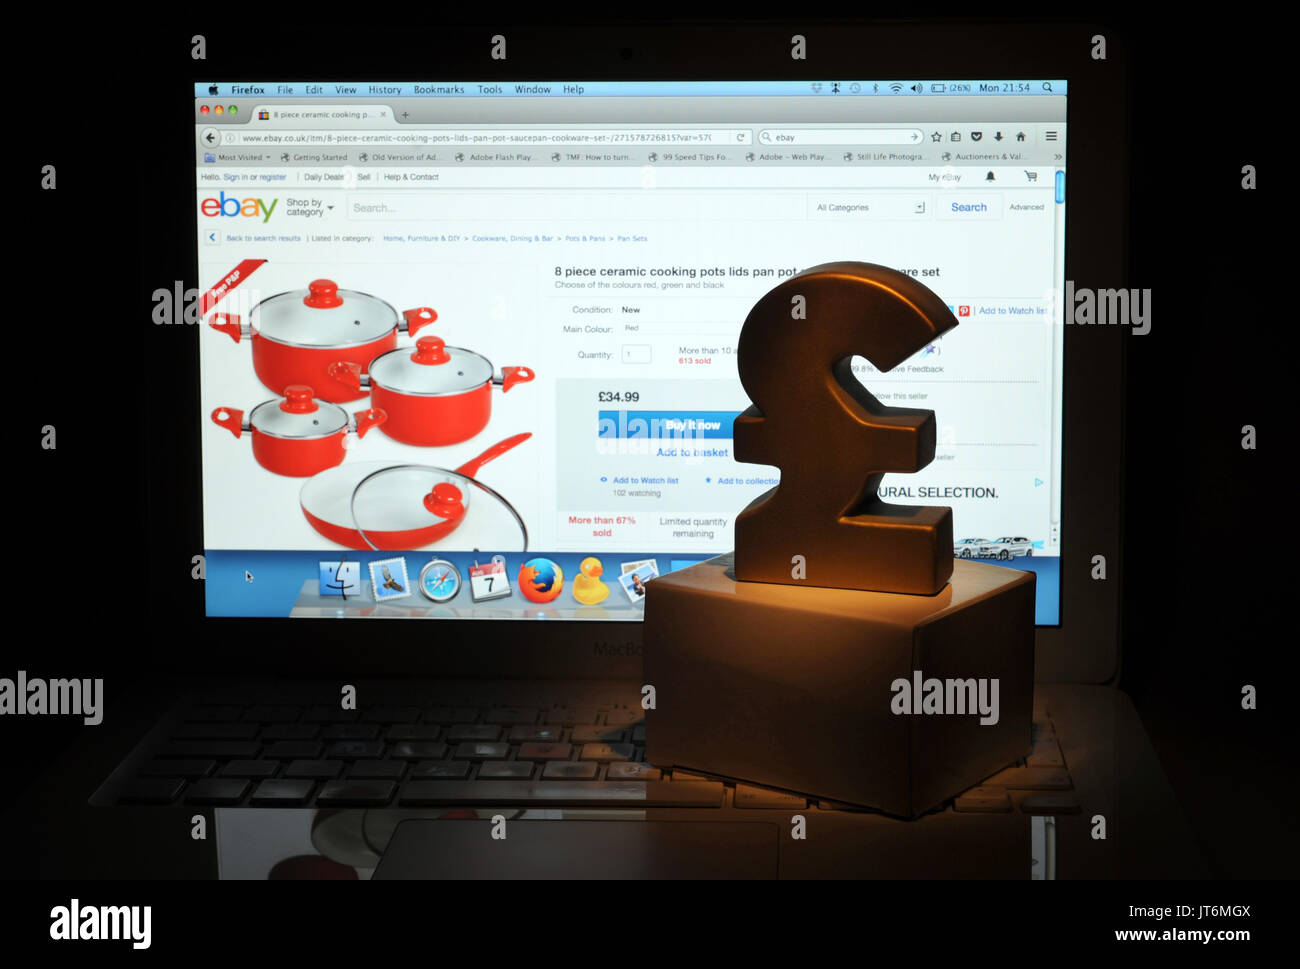 EBAY PAGE ON LAPTOP WITH BRITISH POUND SIGN RE ONLINE BUYING INTERNET SHOPPING THE ECONOMY UK - Stock Image